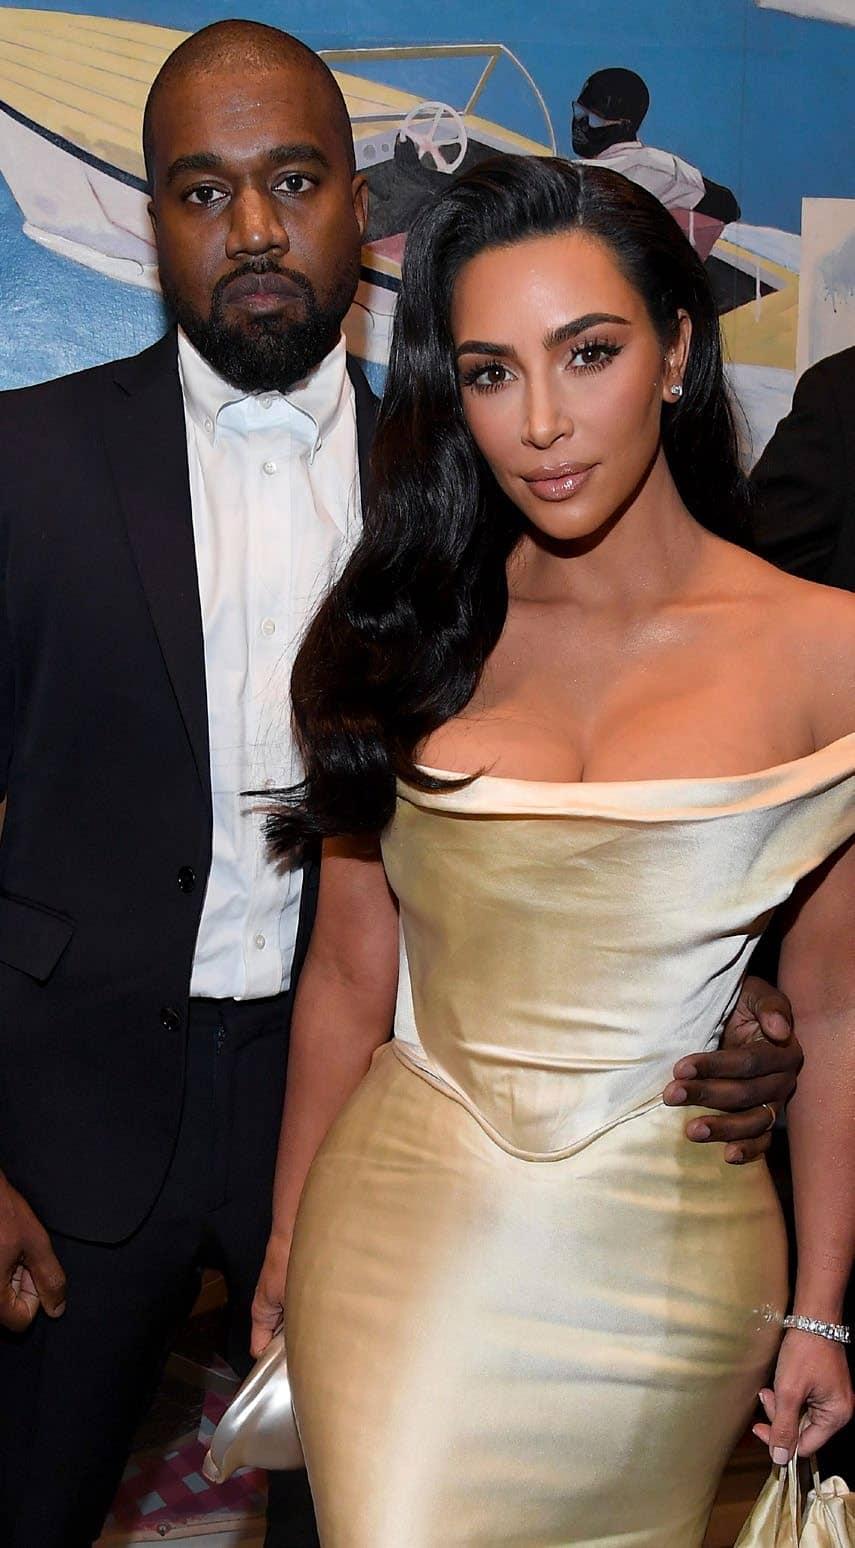 Kanye confesses - I CHEATED ON KIM